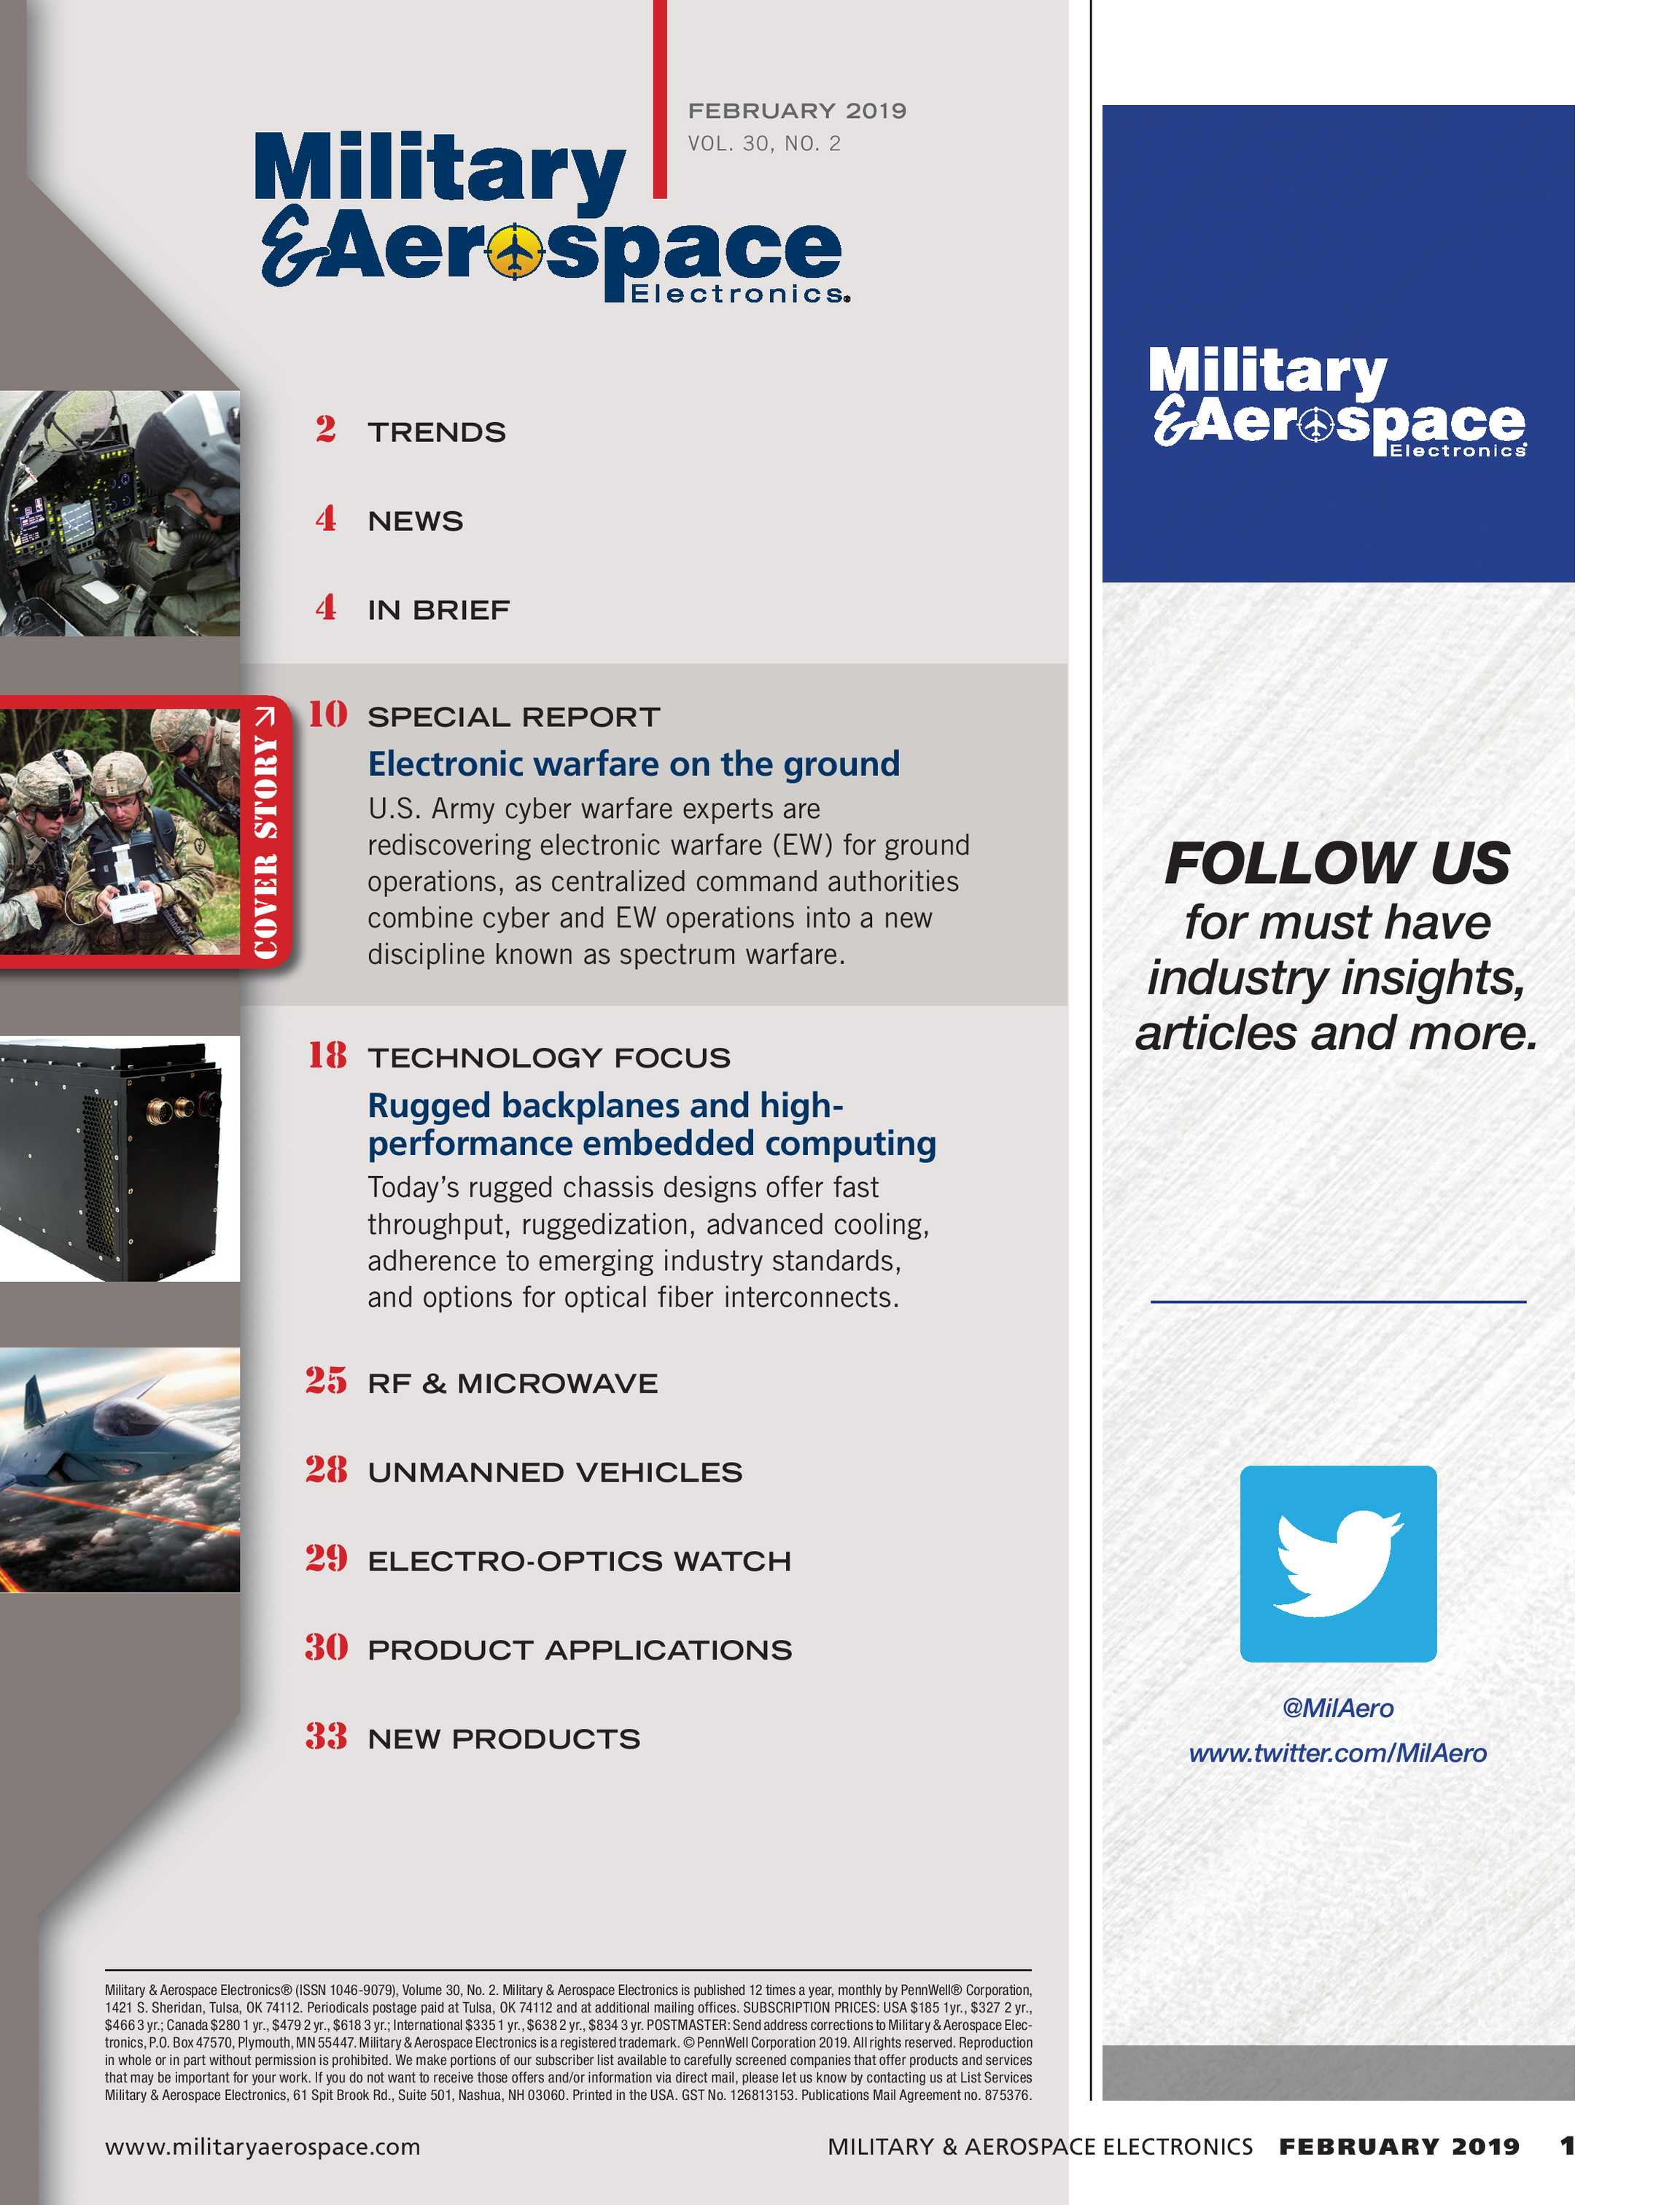 Military & Aerospace Electronics - February 2019 - page 1